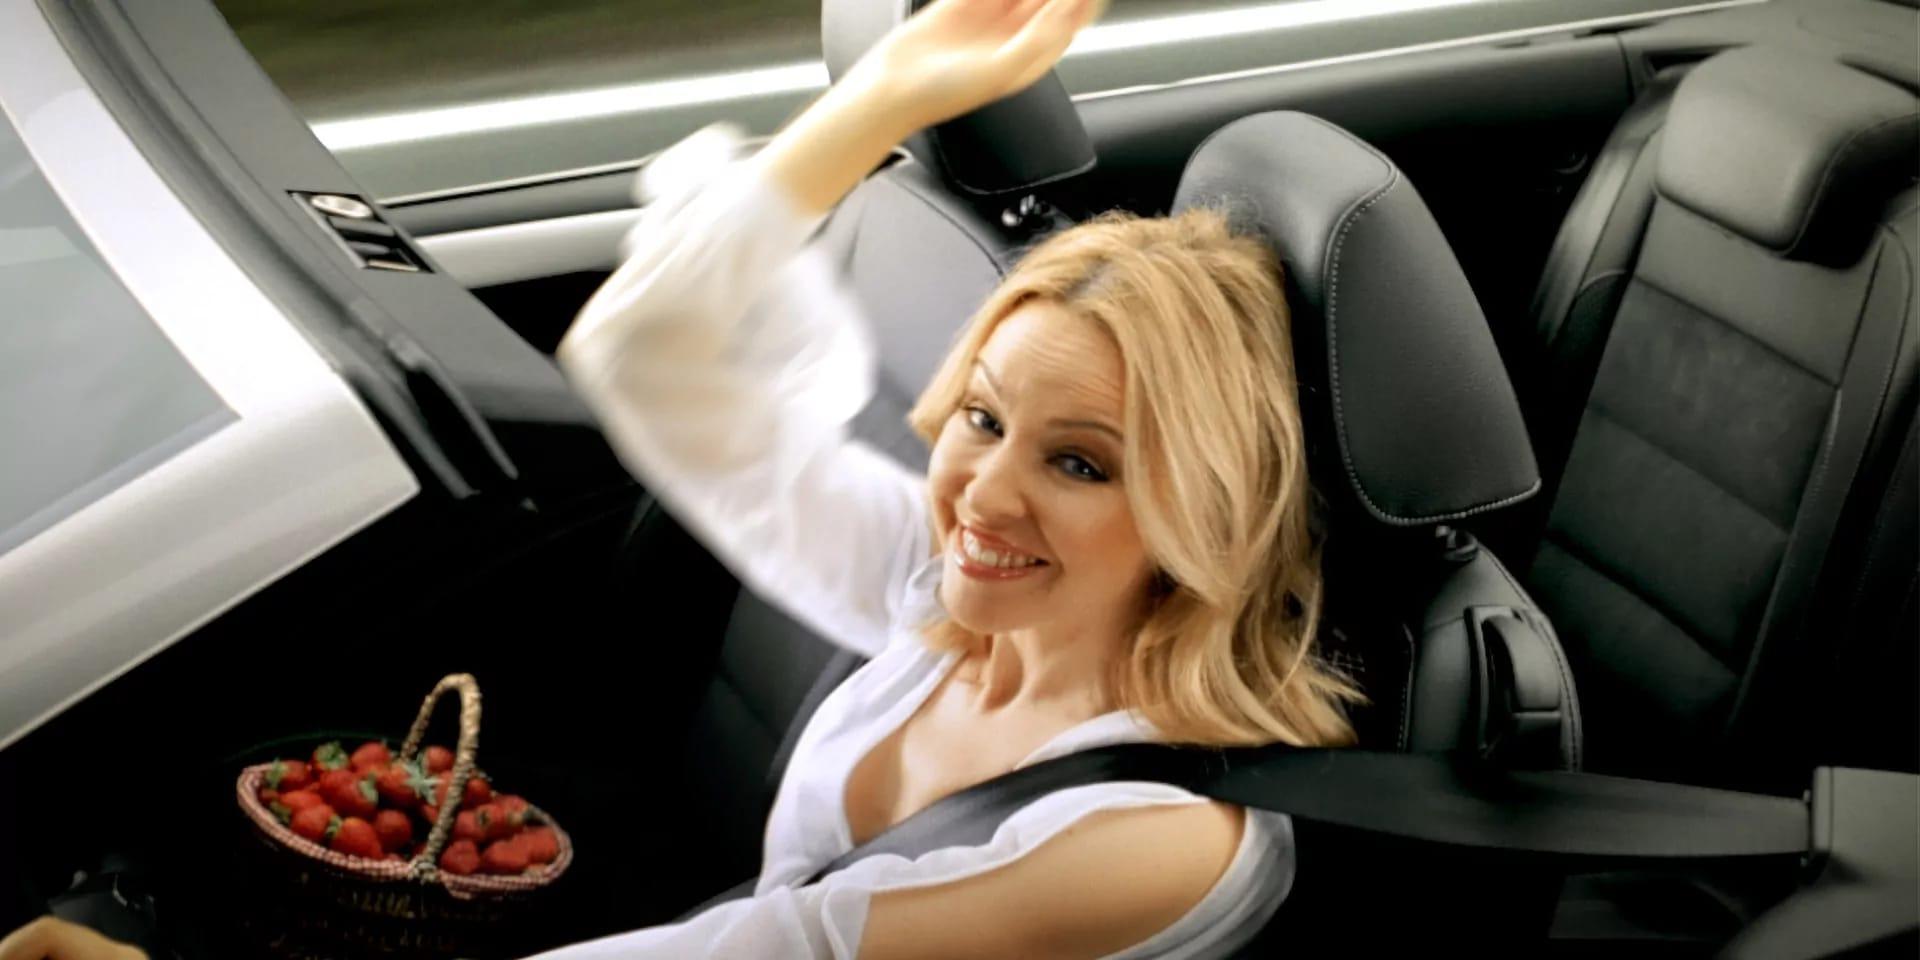 Frau im Auto, die lächelt.